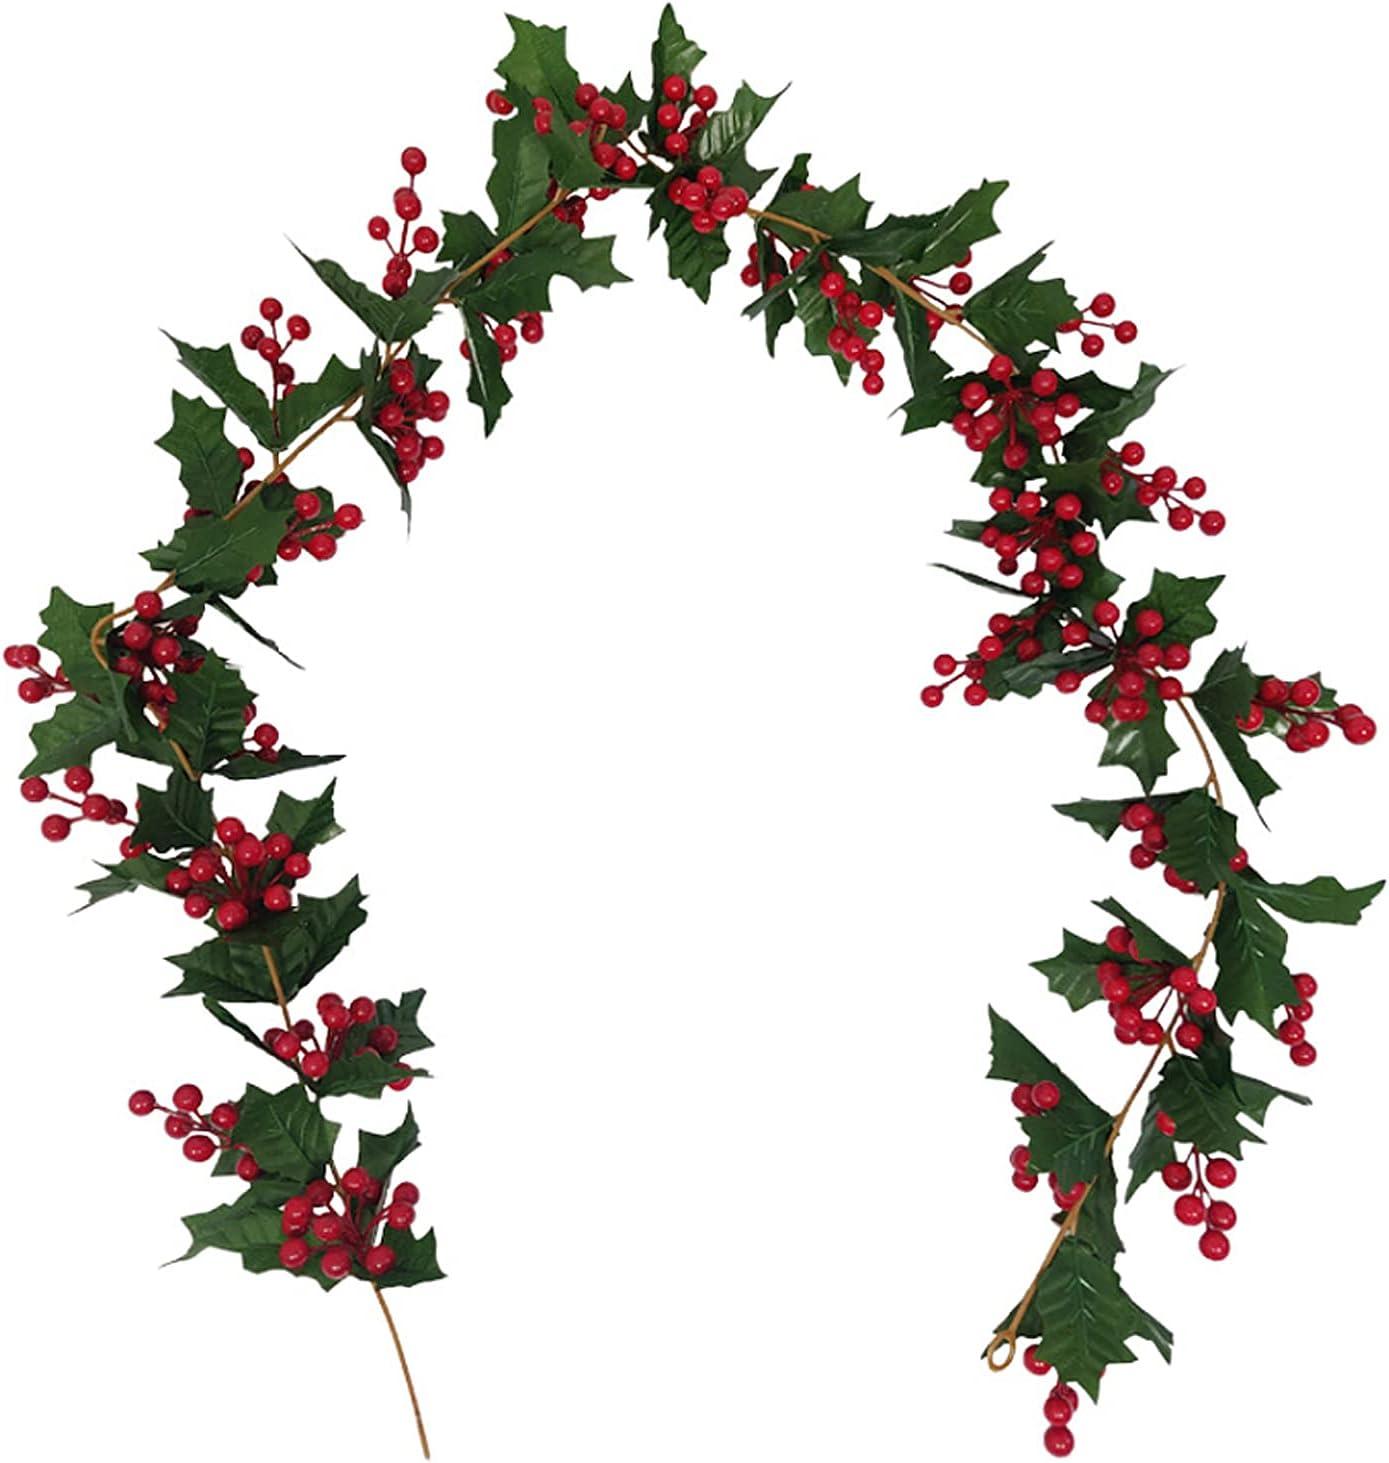 INIFLM Spasm price 5.5 Feet Christmas Red Berries with Leaves Green Ch Vine Brand Cheap Sale Venue